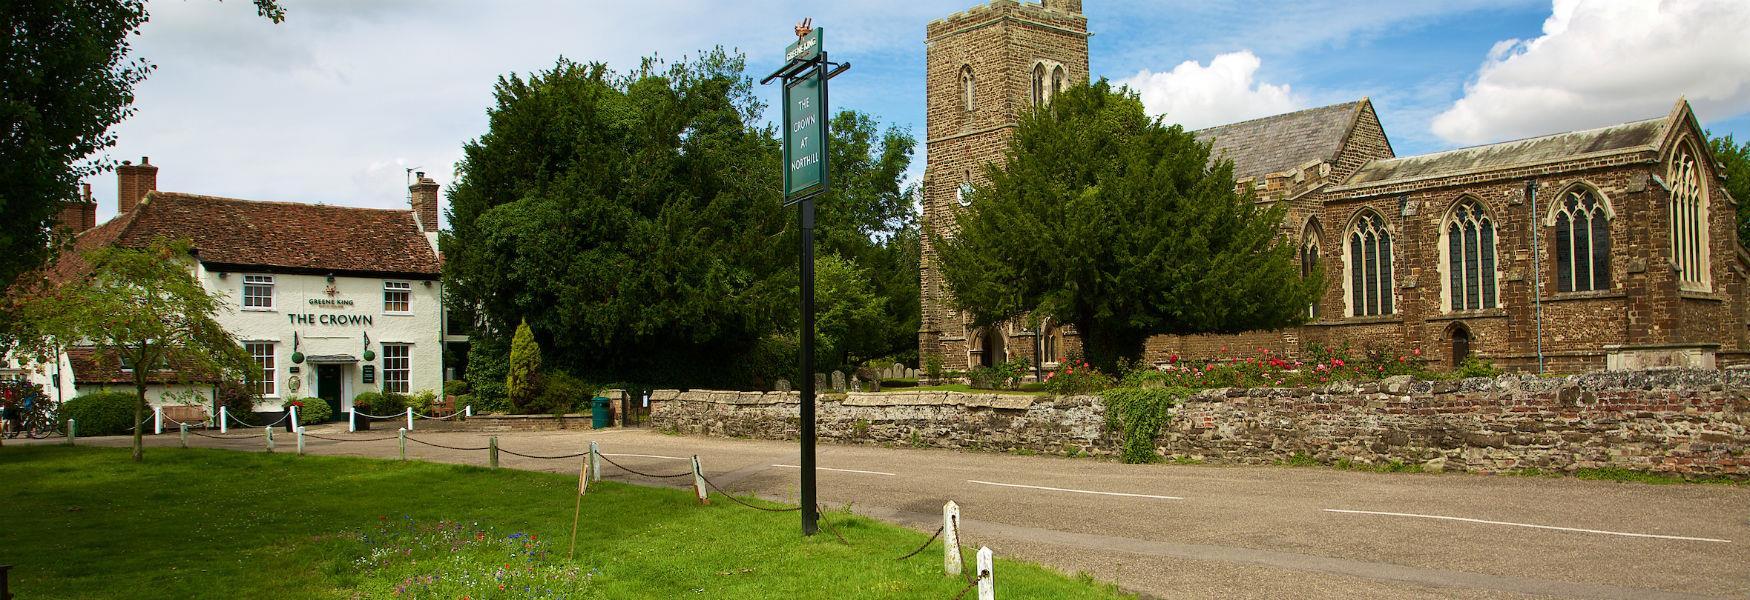 Local church and public house